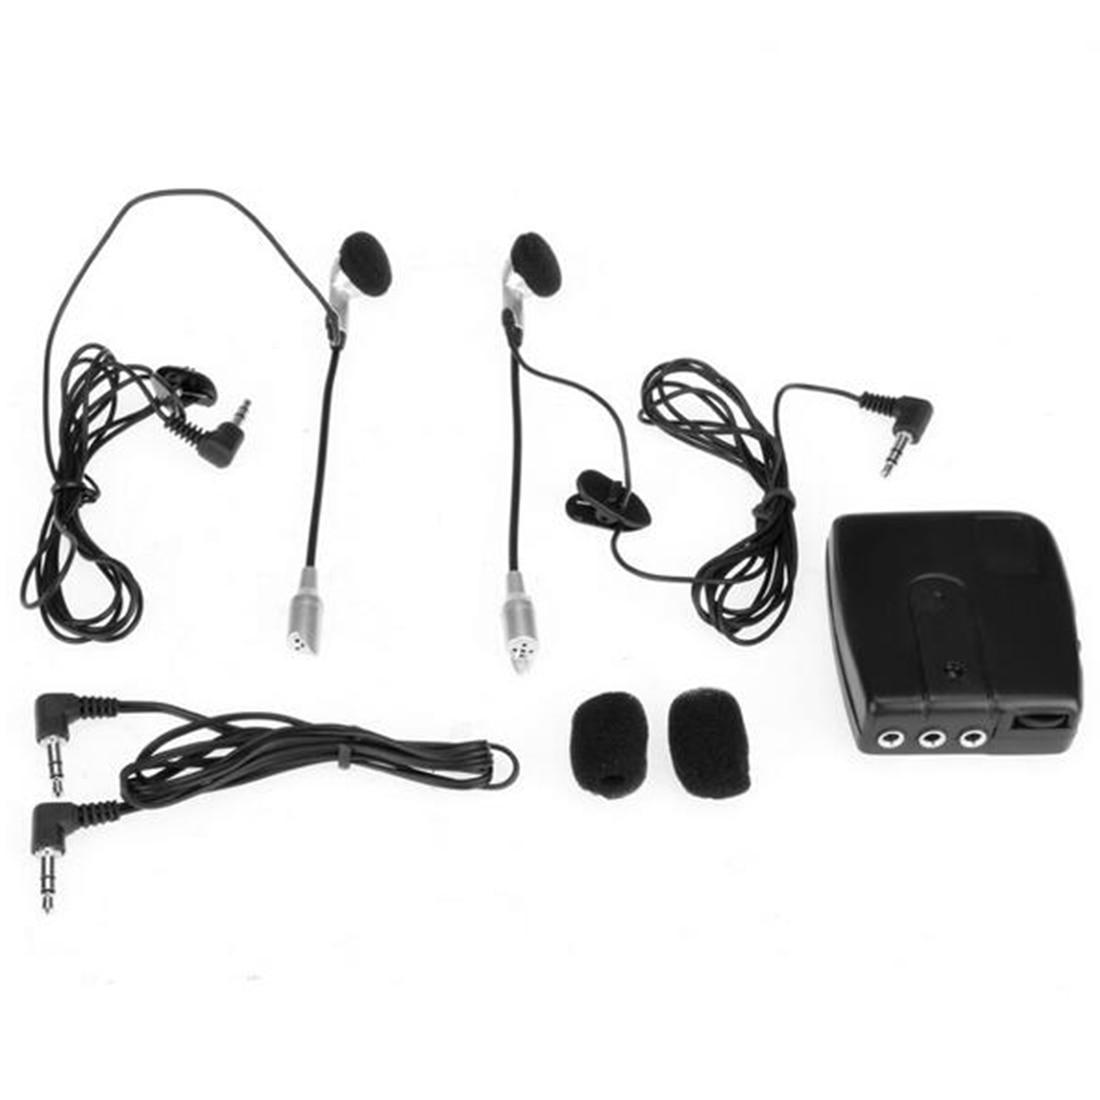 Dewtreetali 2 way Motorbike Intercom Motorcycle Helmet Headset Communication System Interphone motor Headset  Earphone